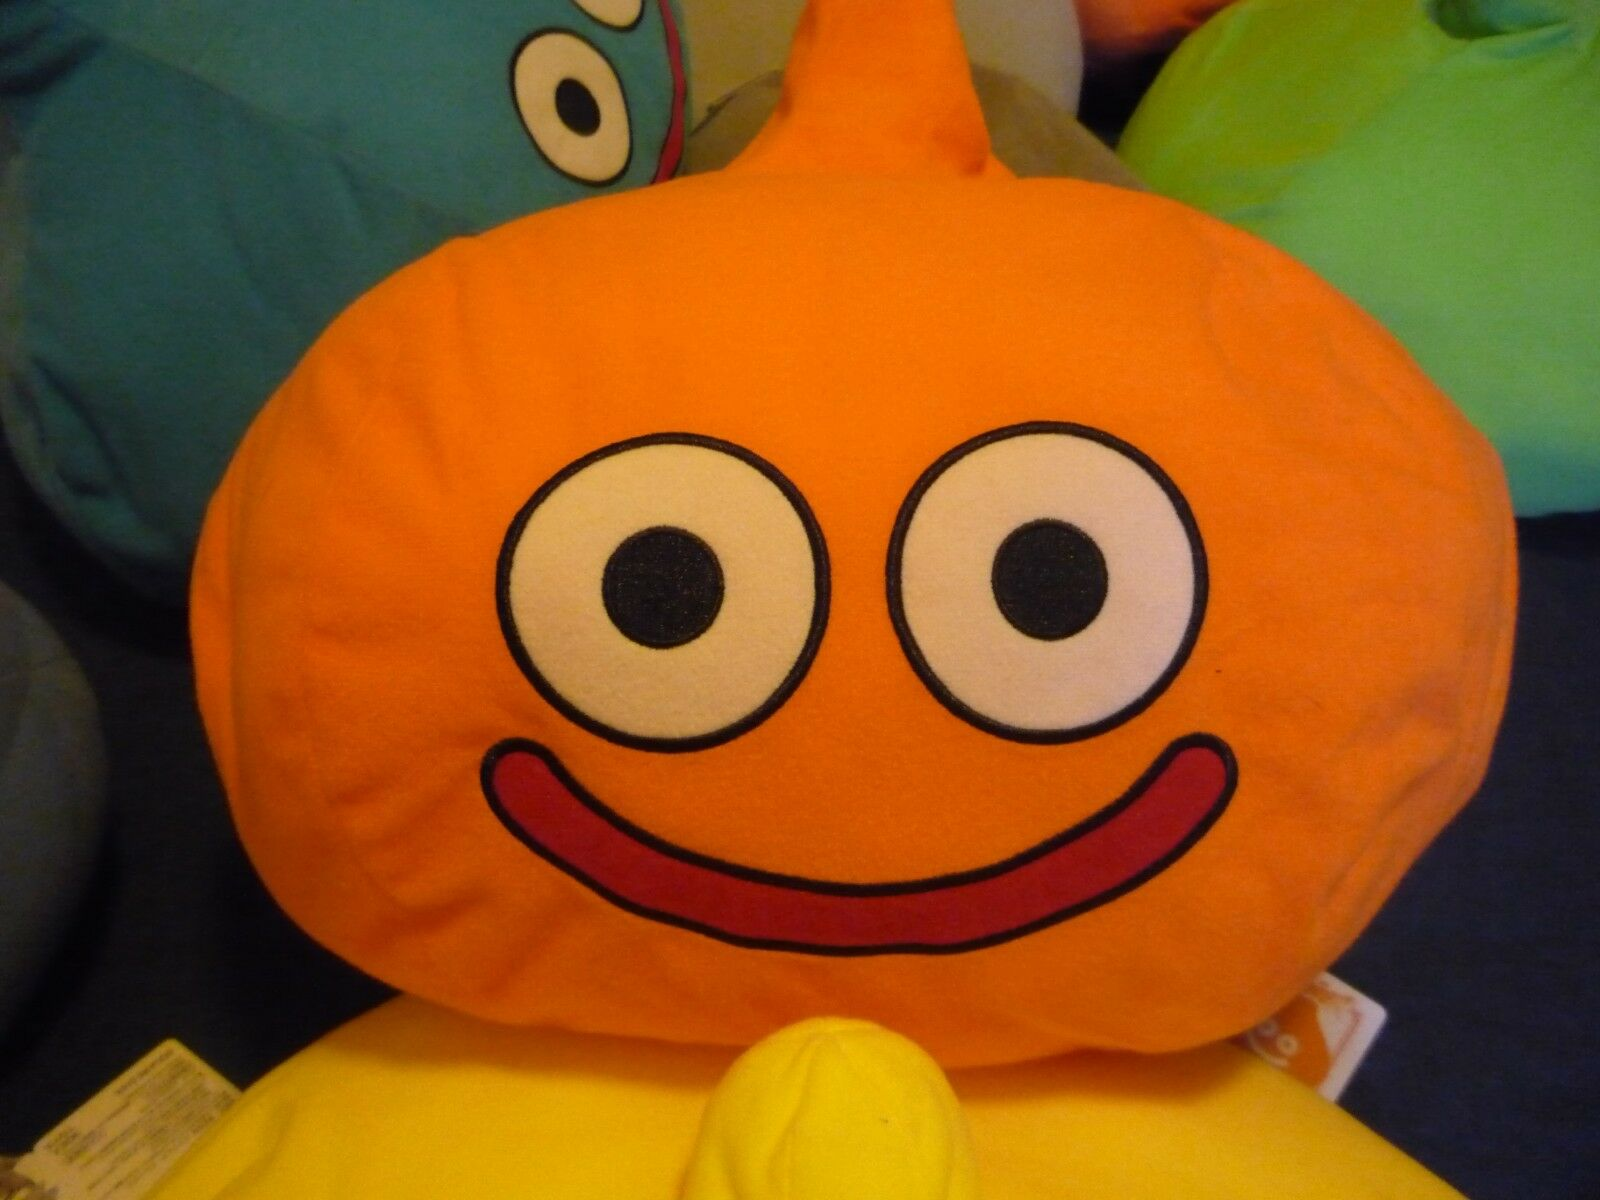 DRAGON QUEST PELUCHE/PLUSH RARE PROMO Orange SLIME 40CM ENVIRON